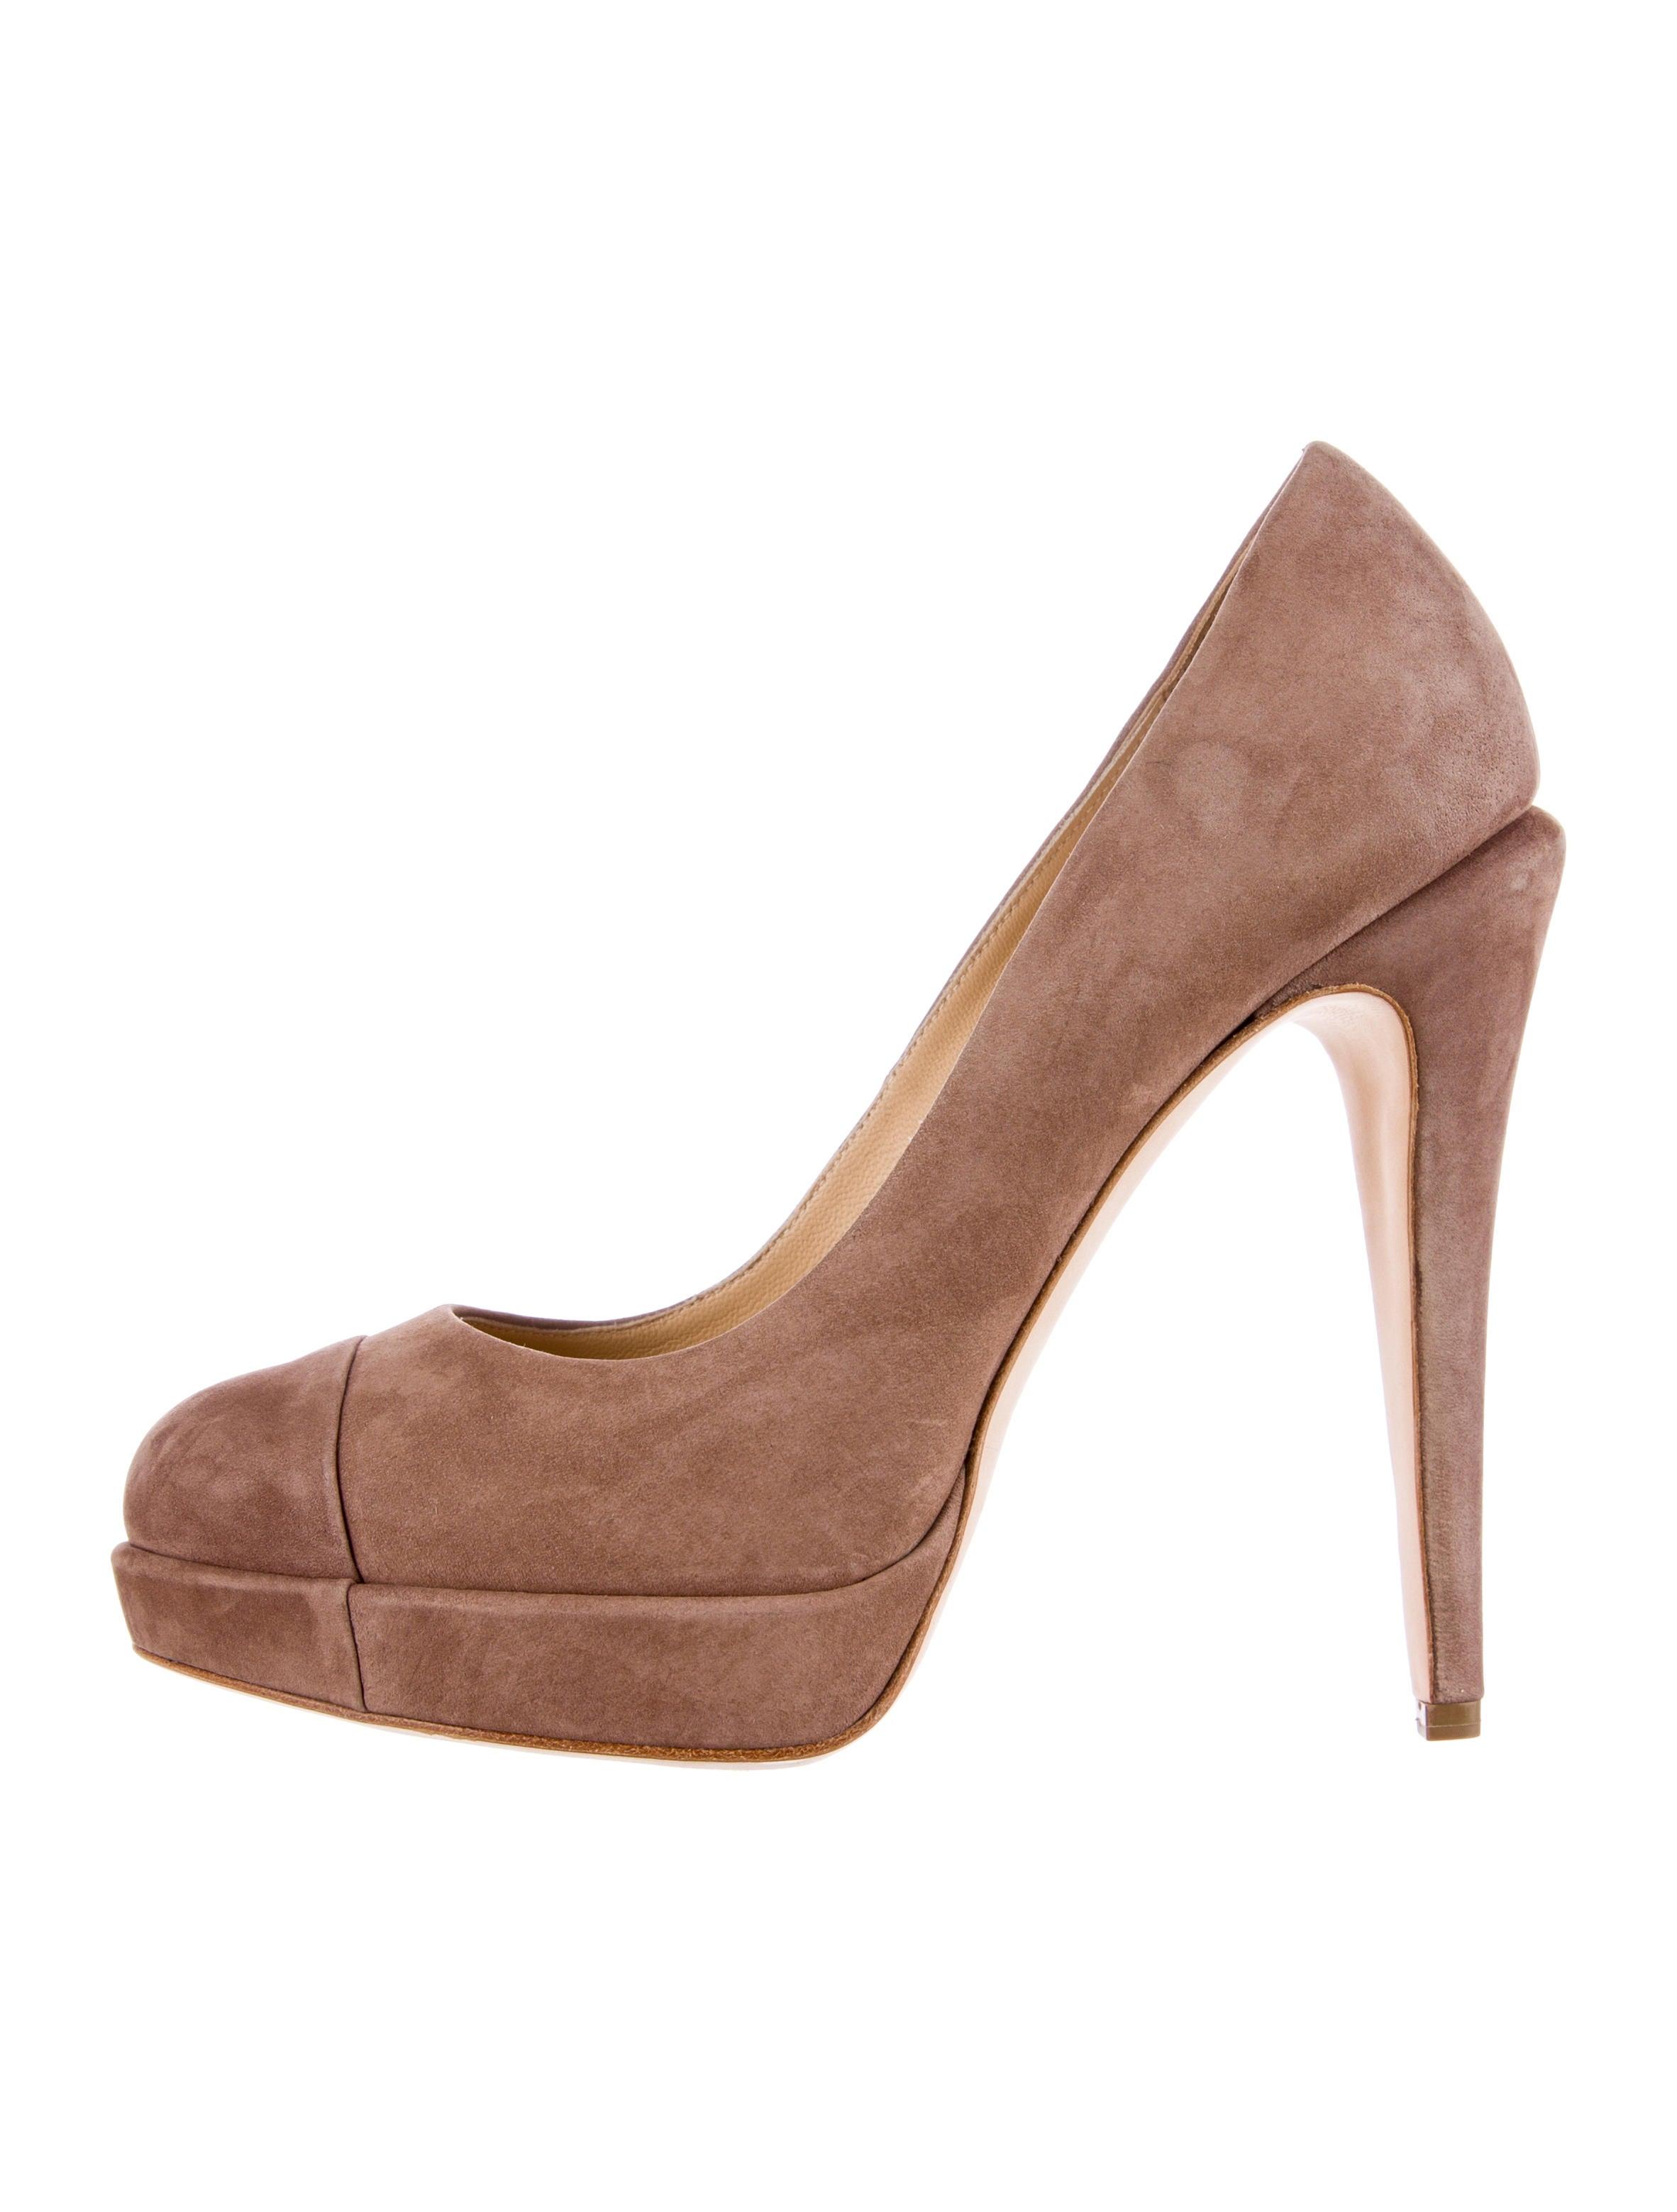 chanel platform pumps shoes cha62443 the realreal